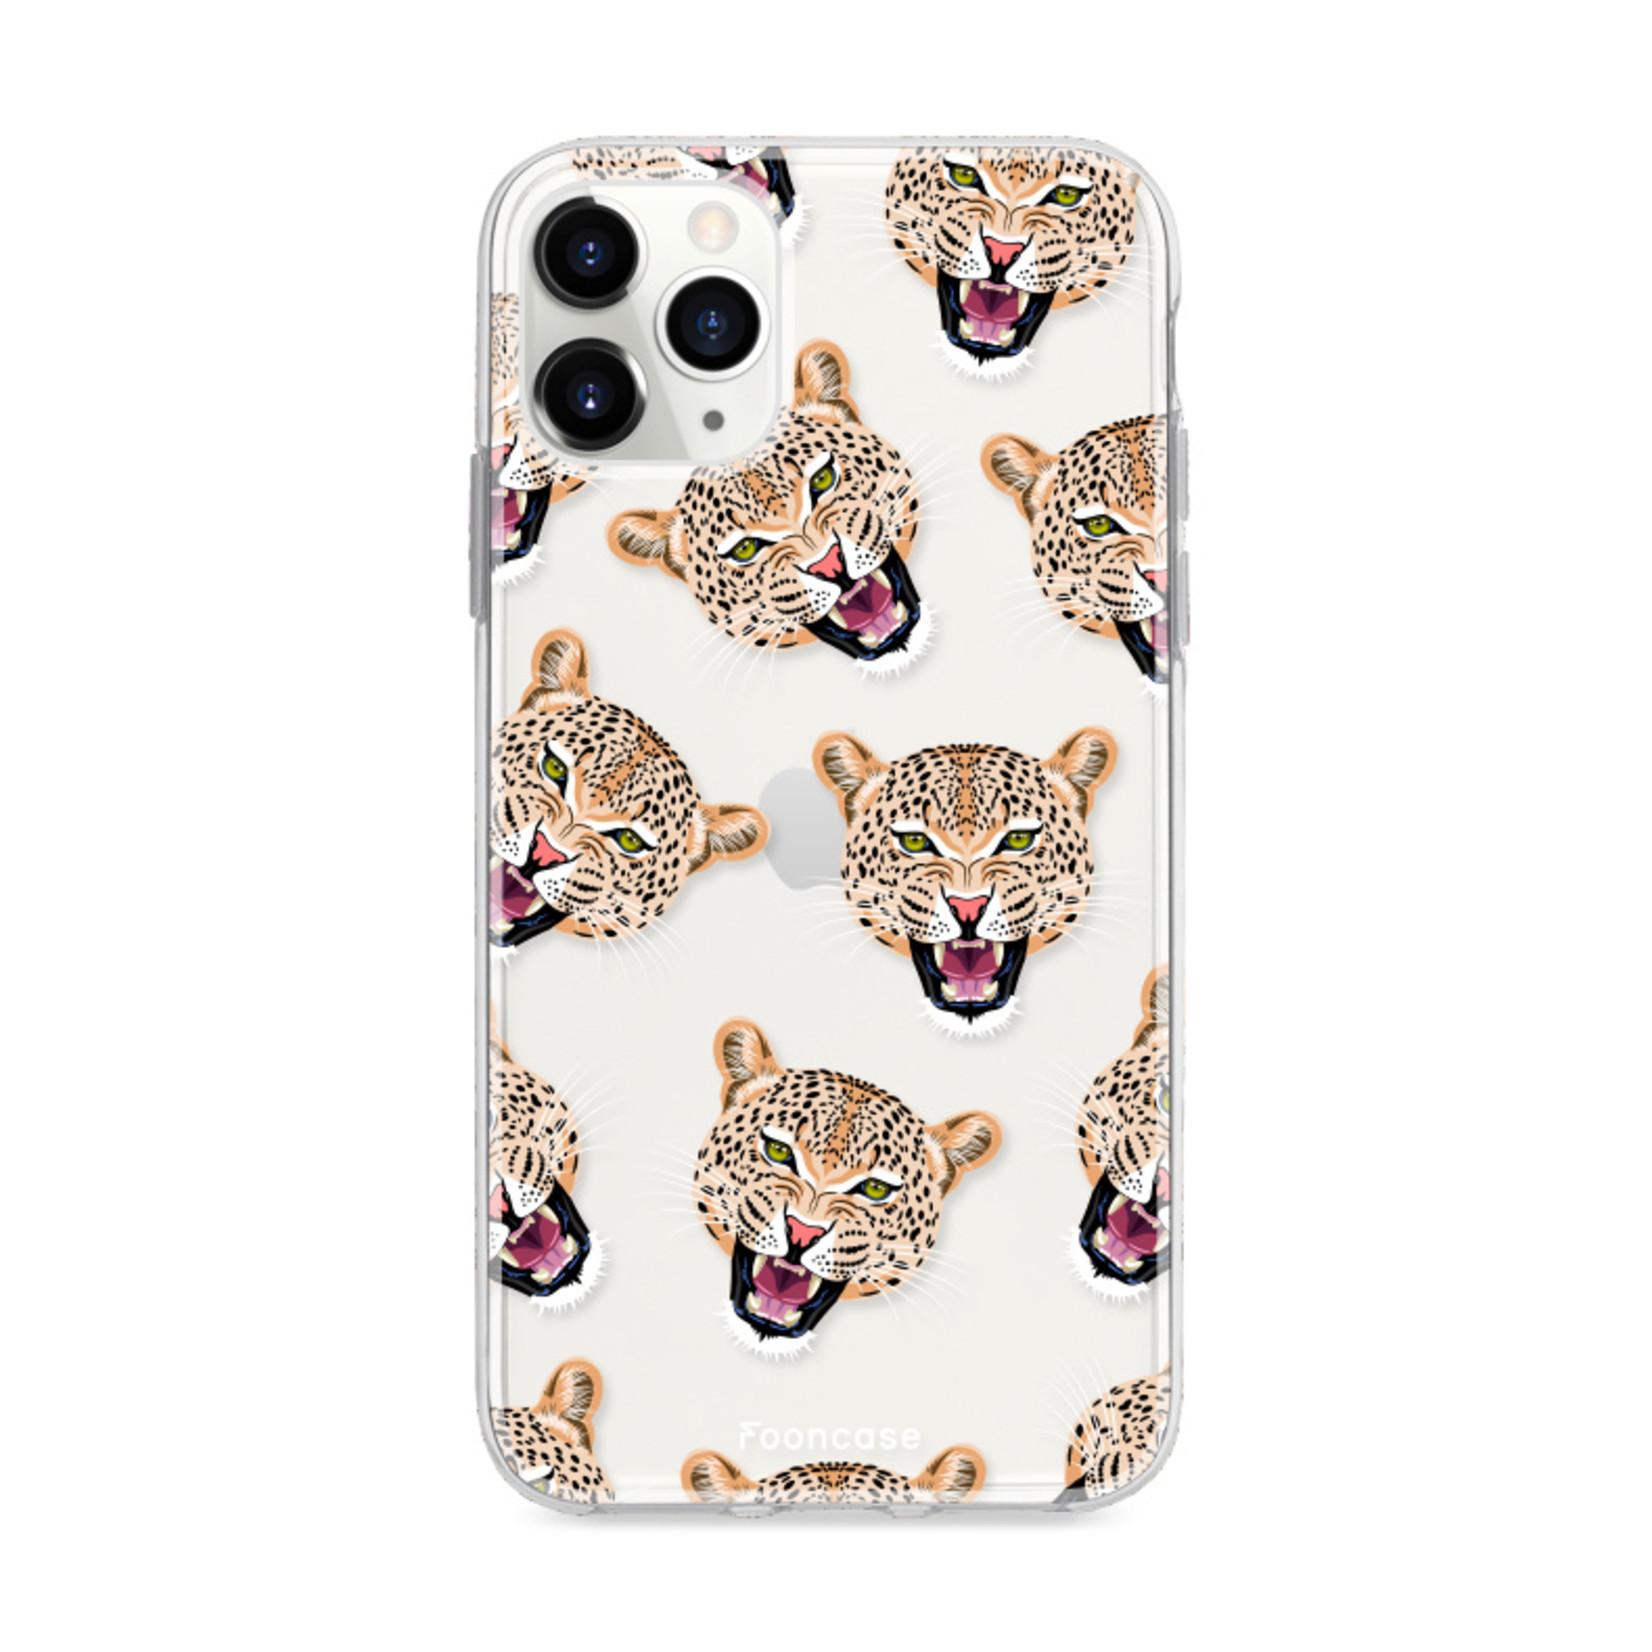 FOONCASE IPhone 11 Pro Max Handyhülle - Cheeky Leopard